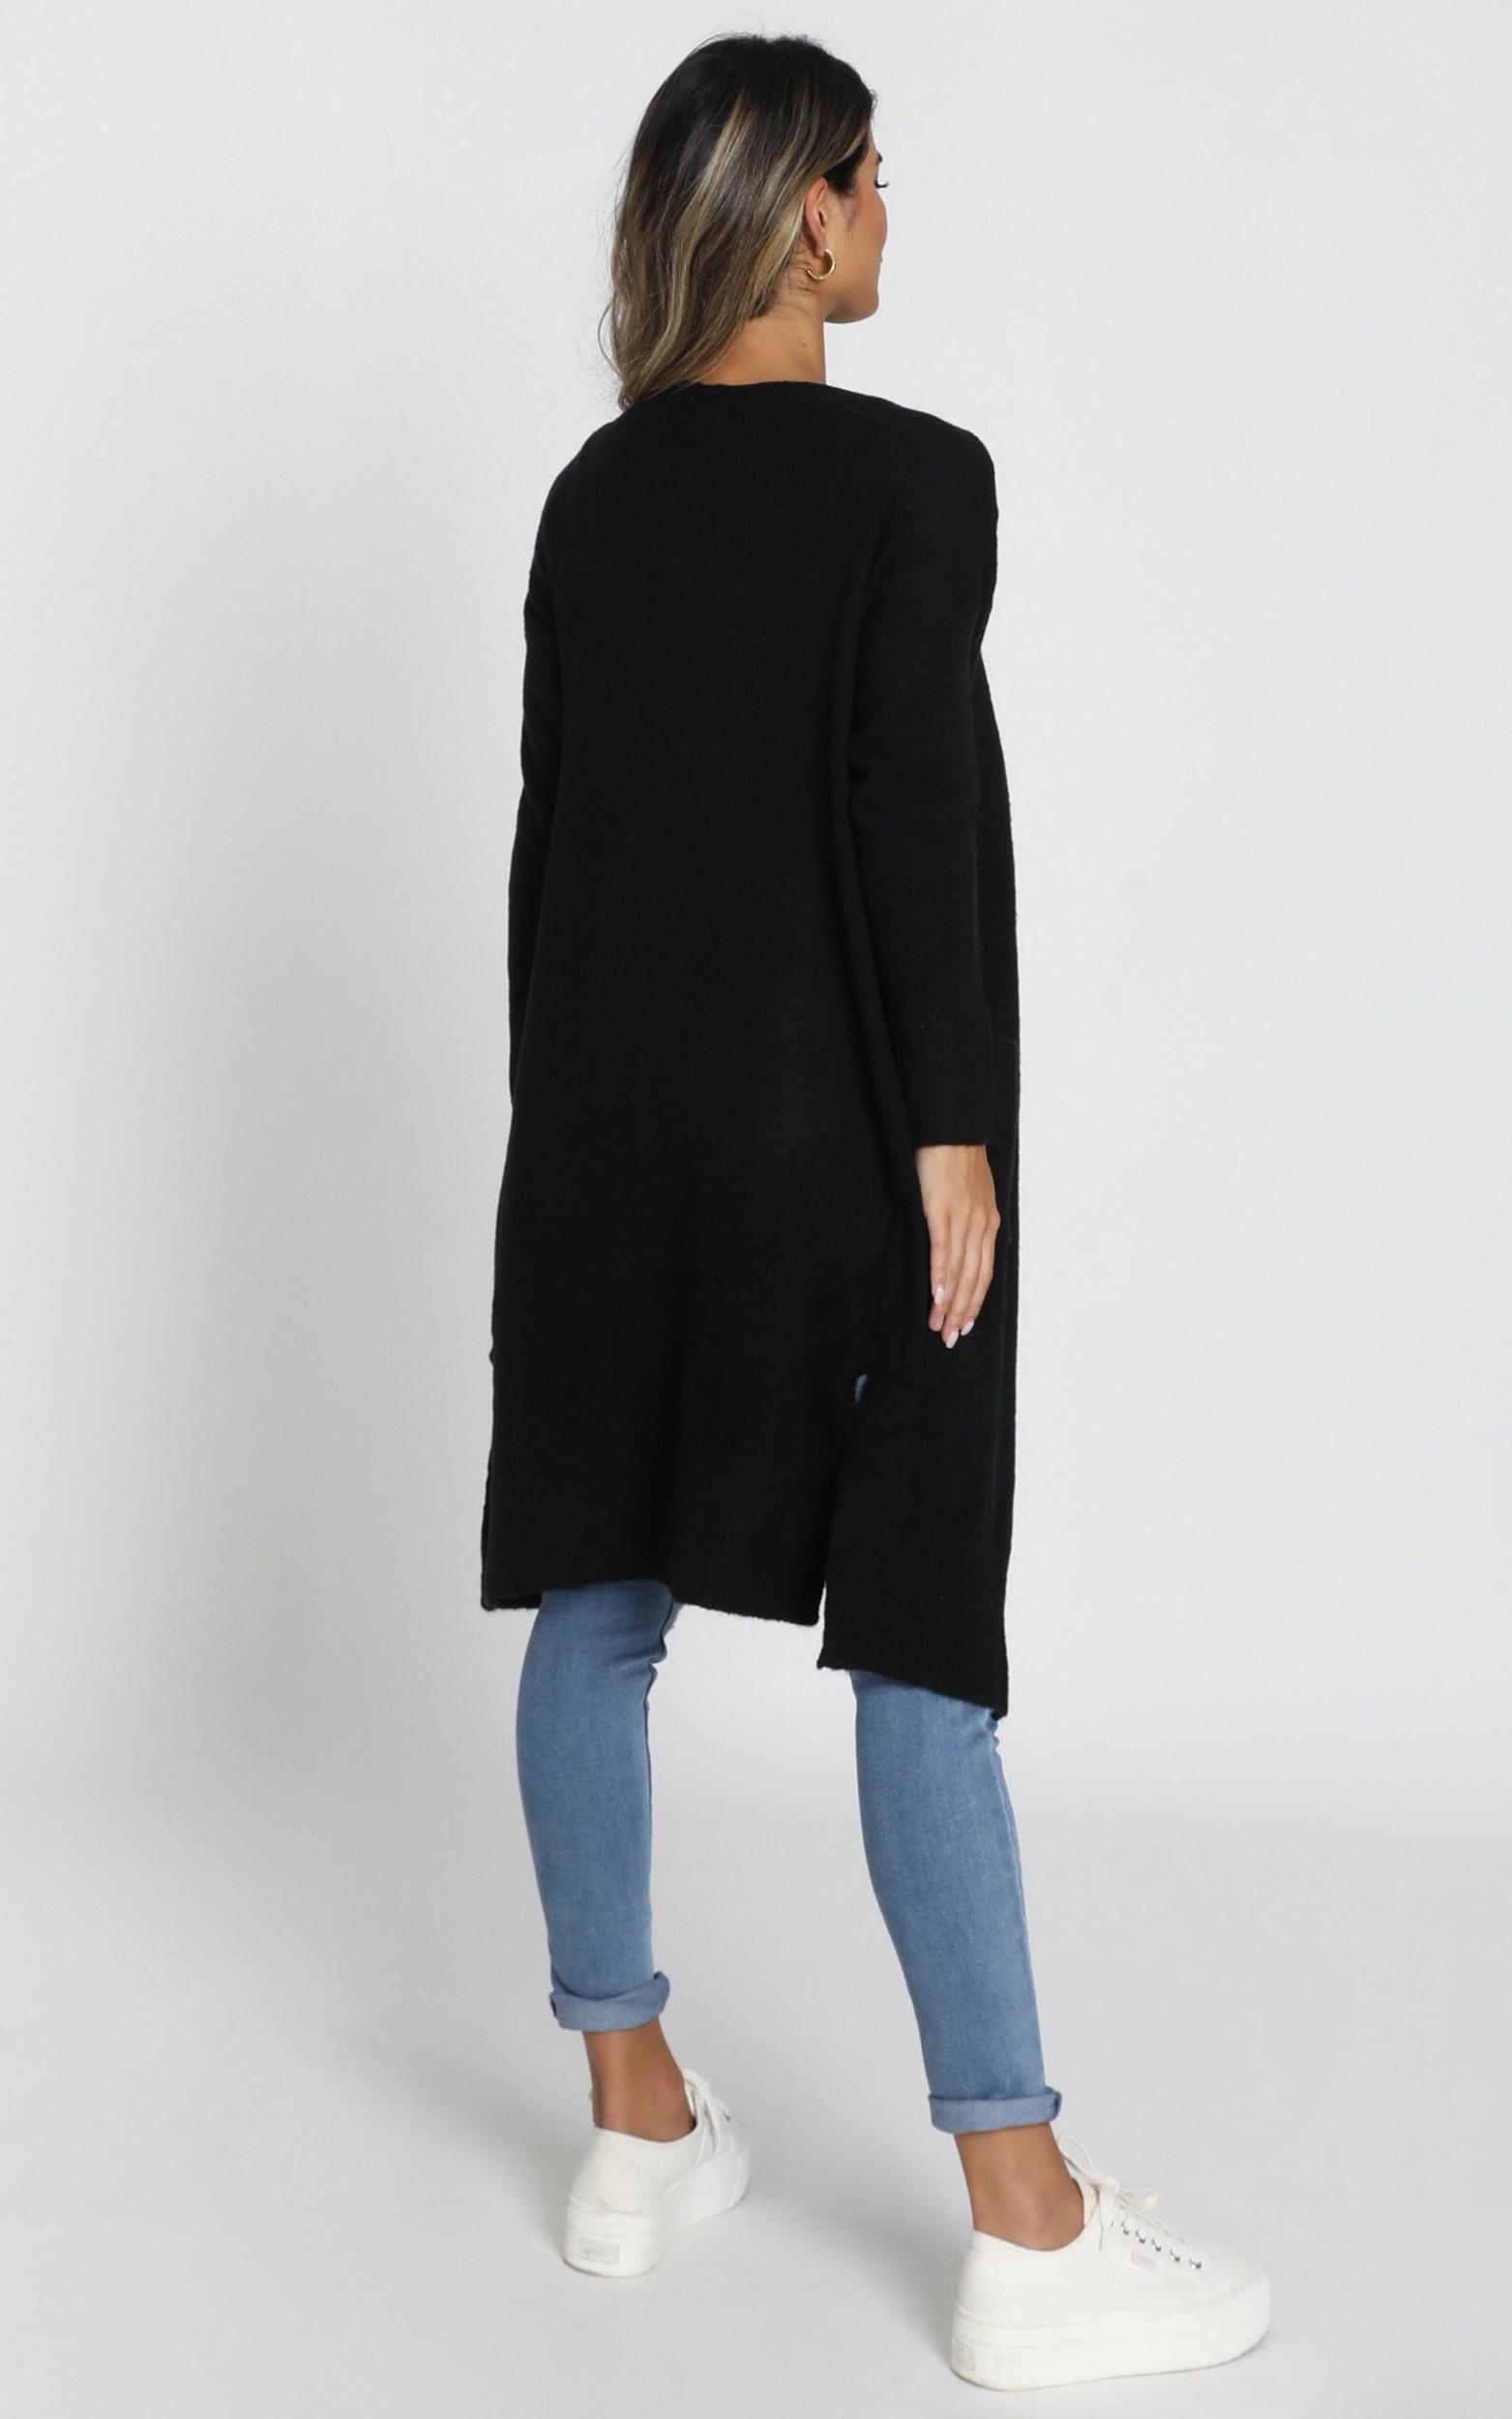 Around The Bend Cardigan in black - 14 (XL), Black, hi-res image number null